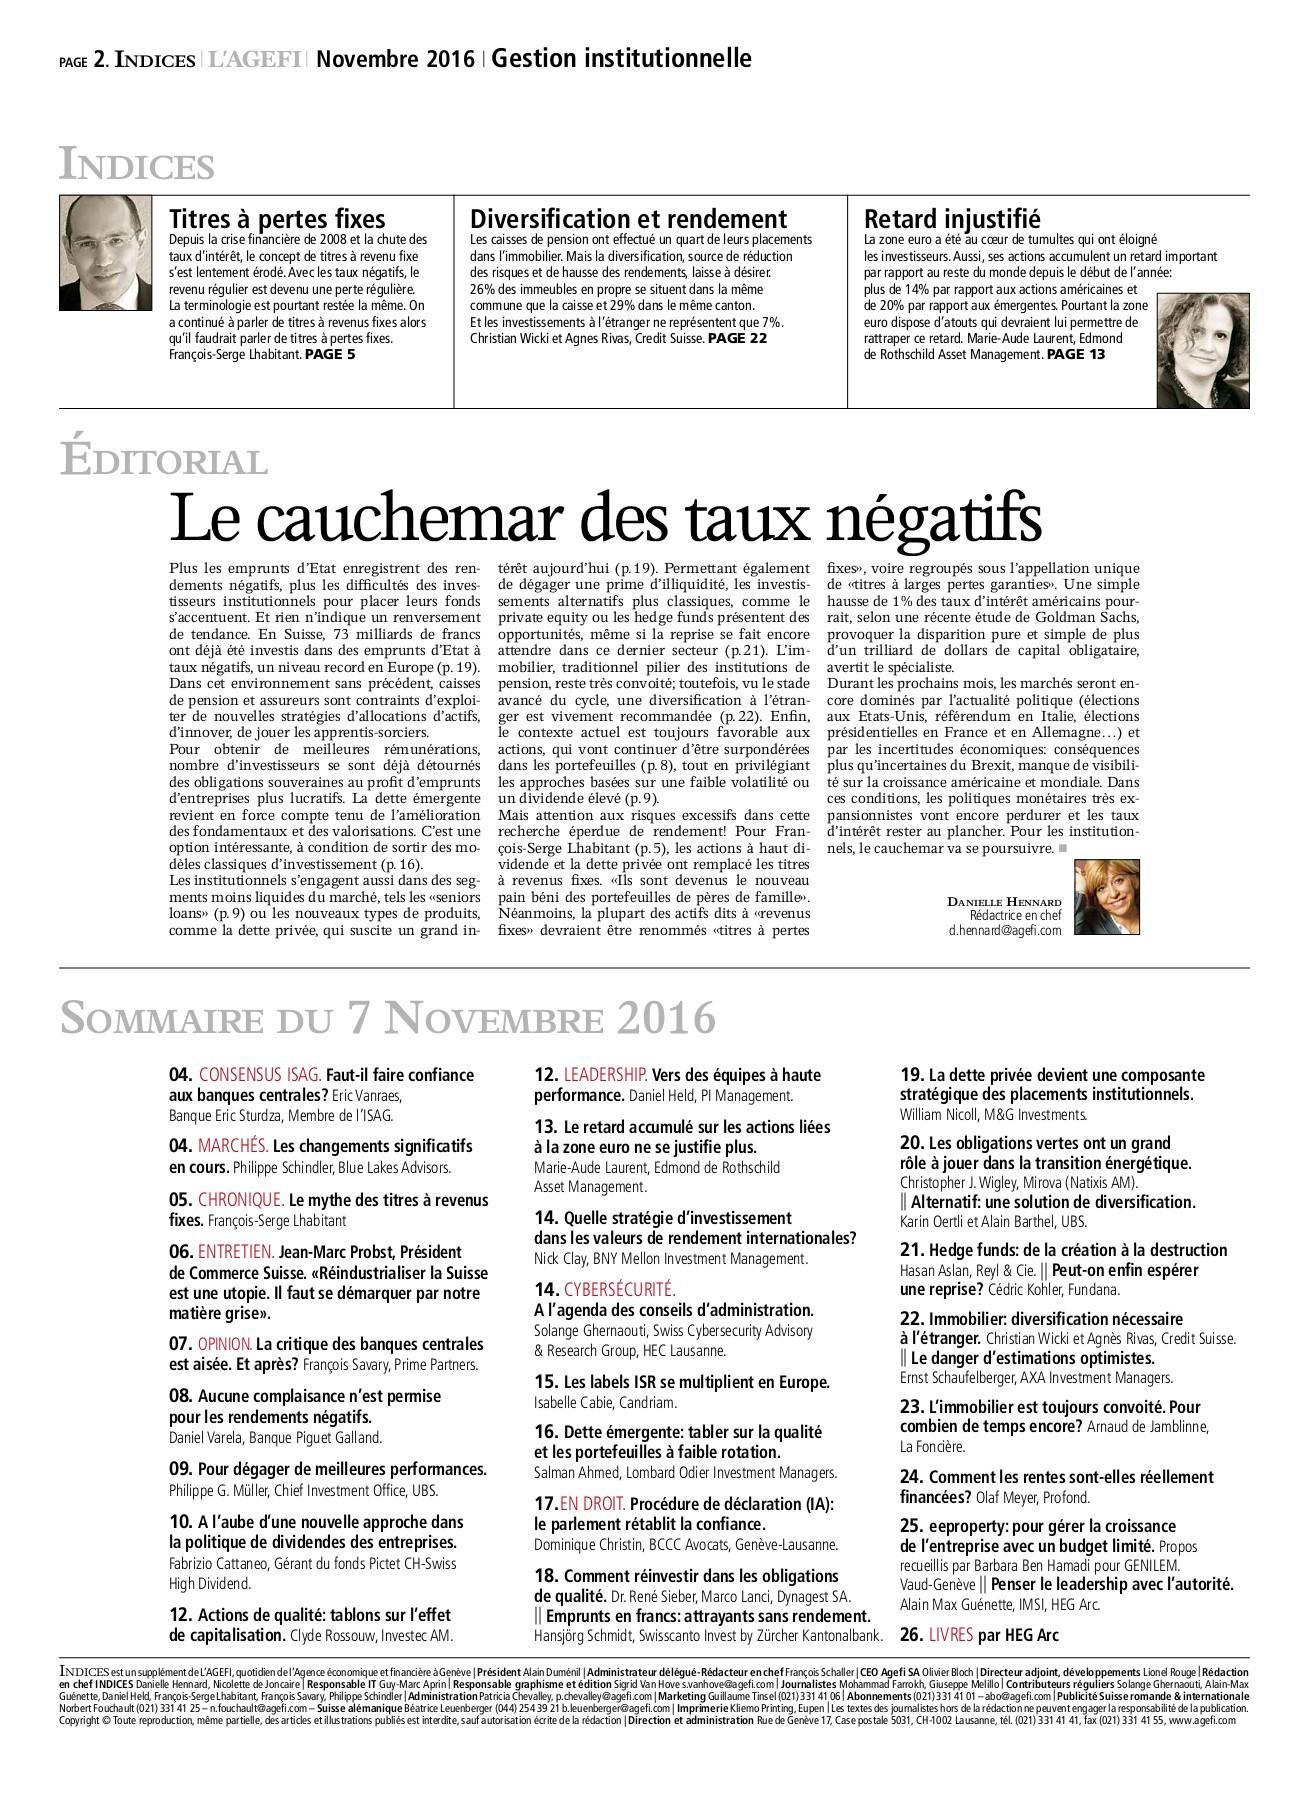 Guide Des Bonnes Manieres Rothschild n° 09 2016 indices - gestion institutionnelle pages 1 - 28